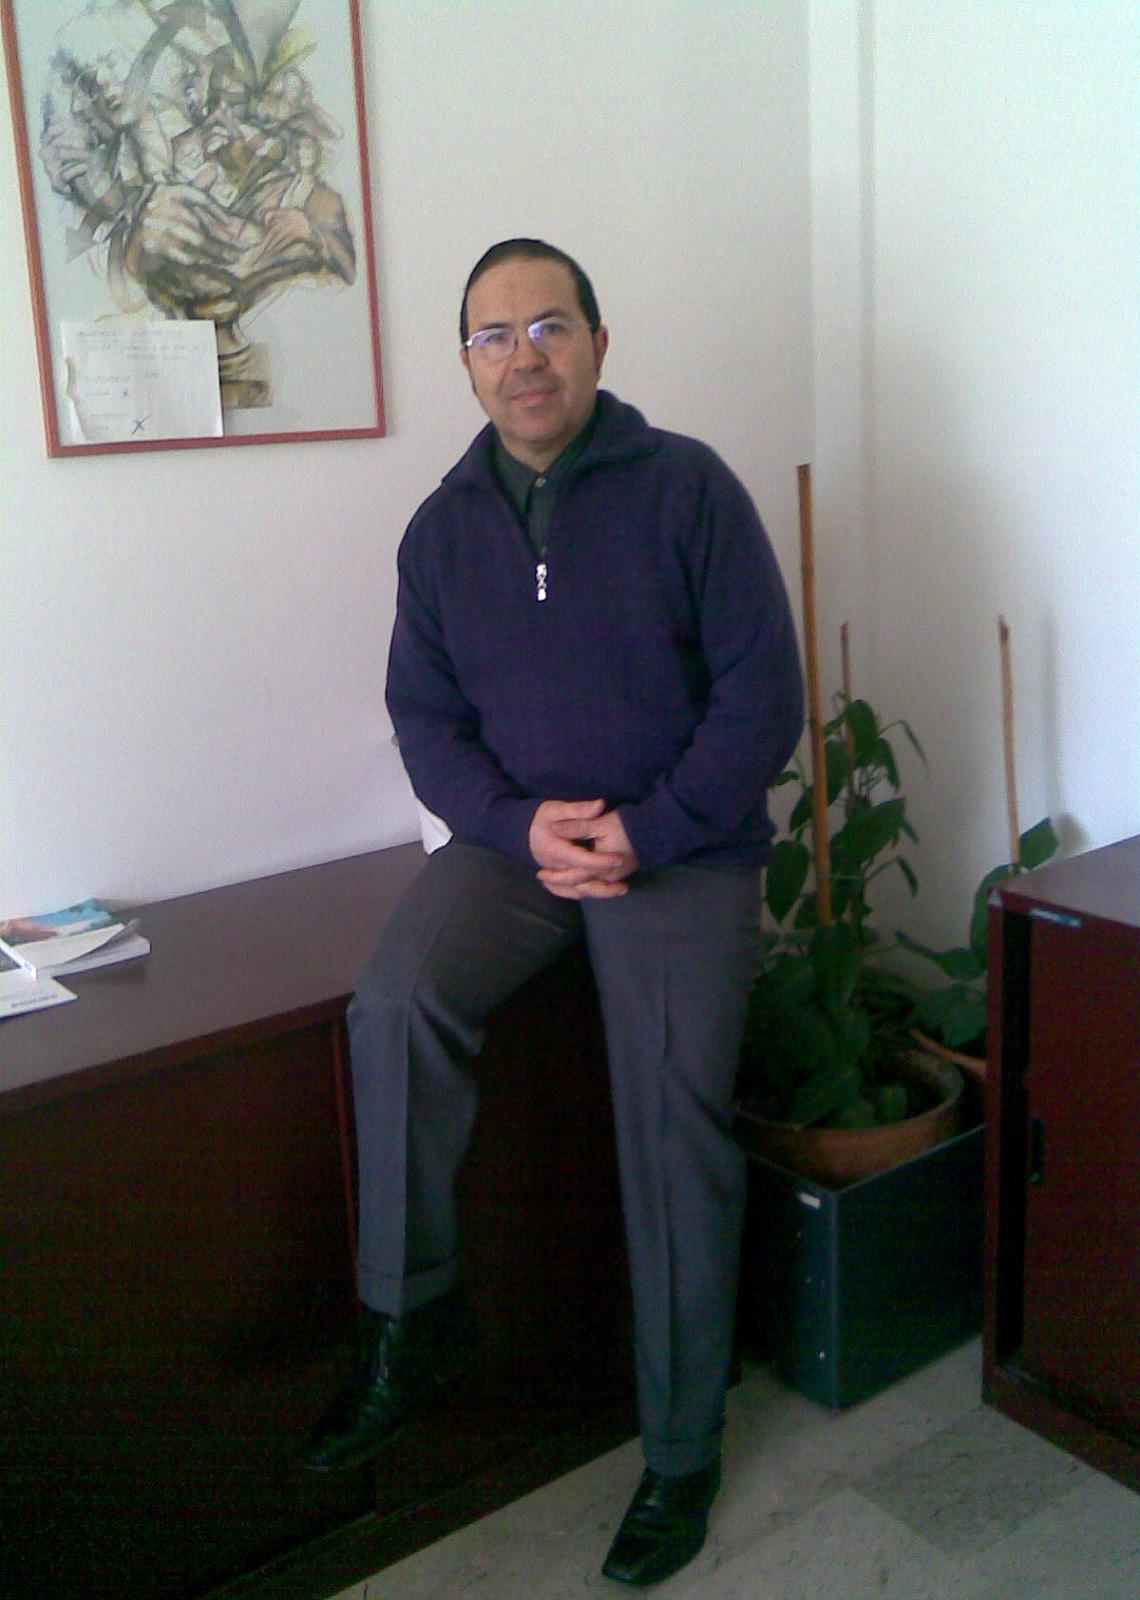 Nicola Liberio